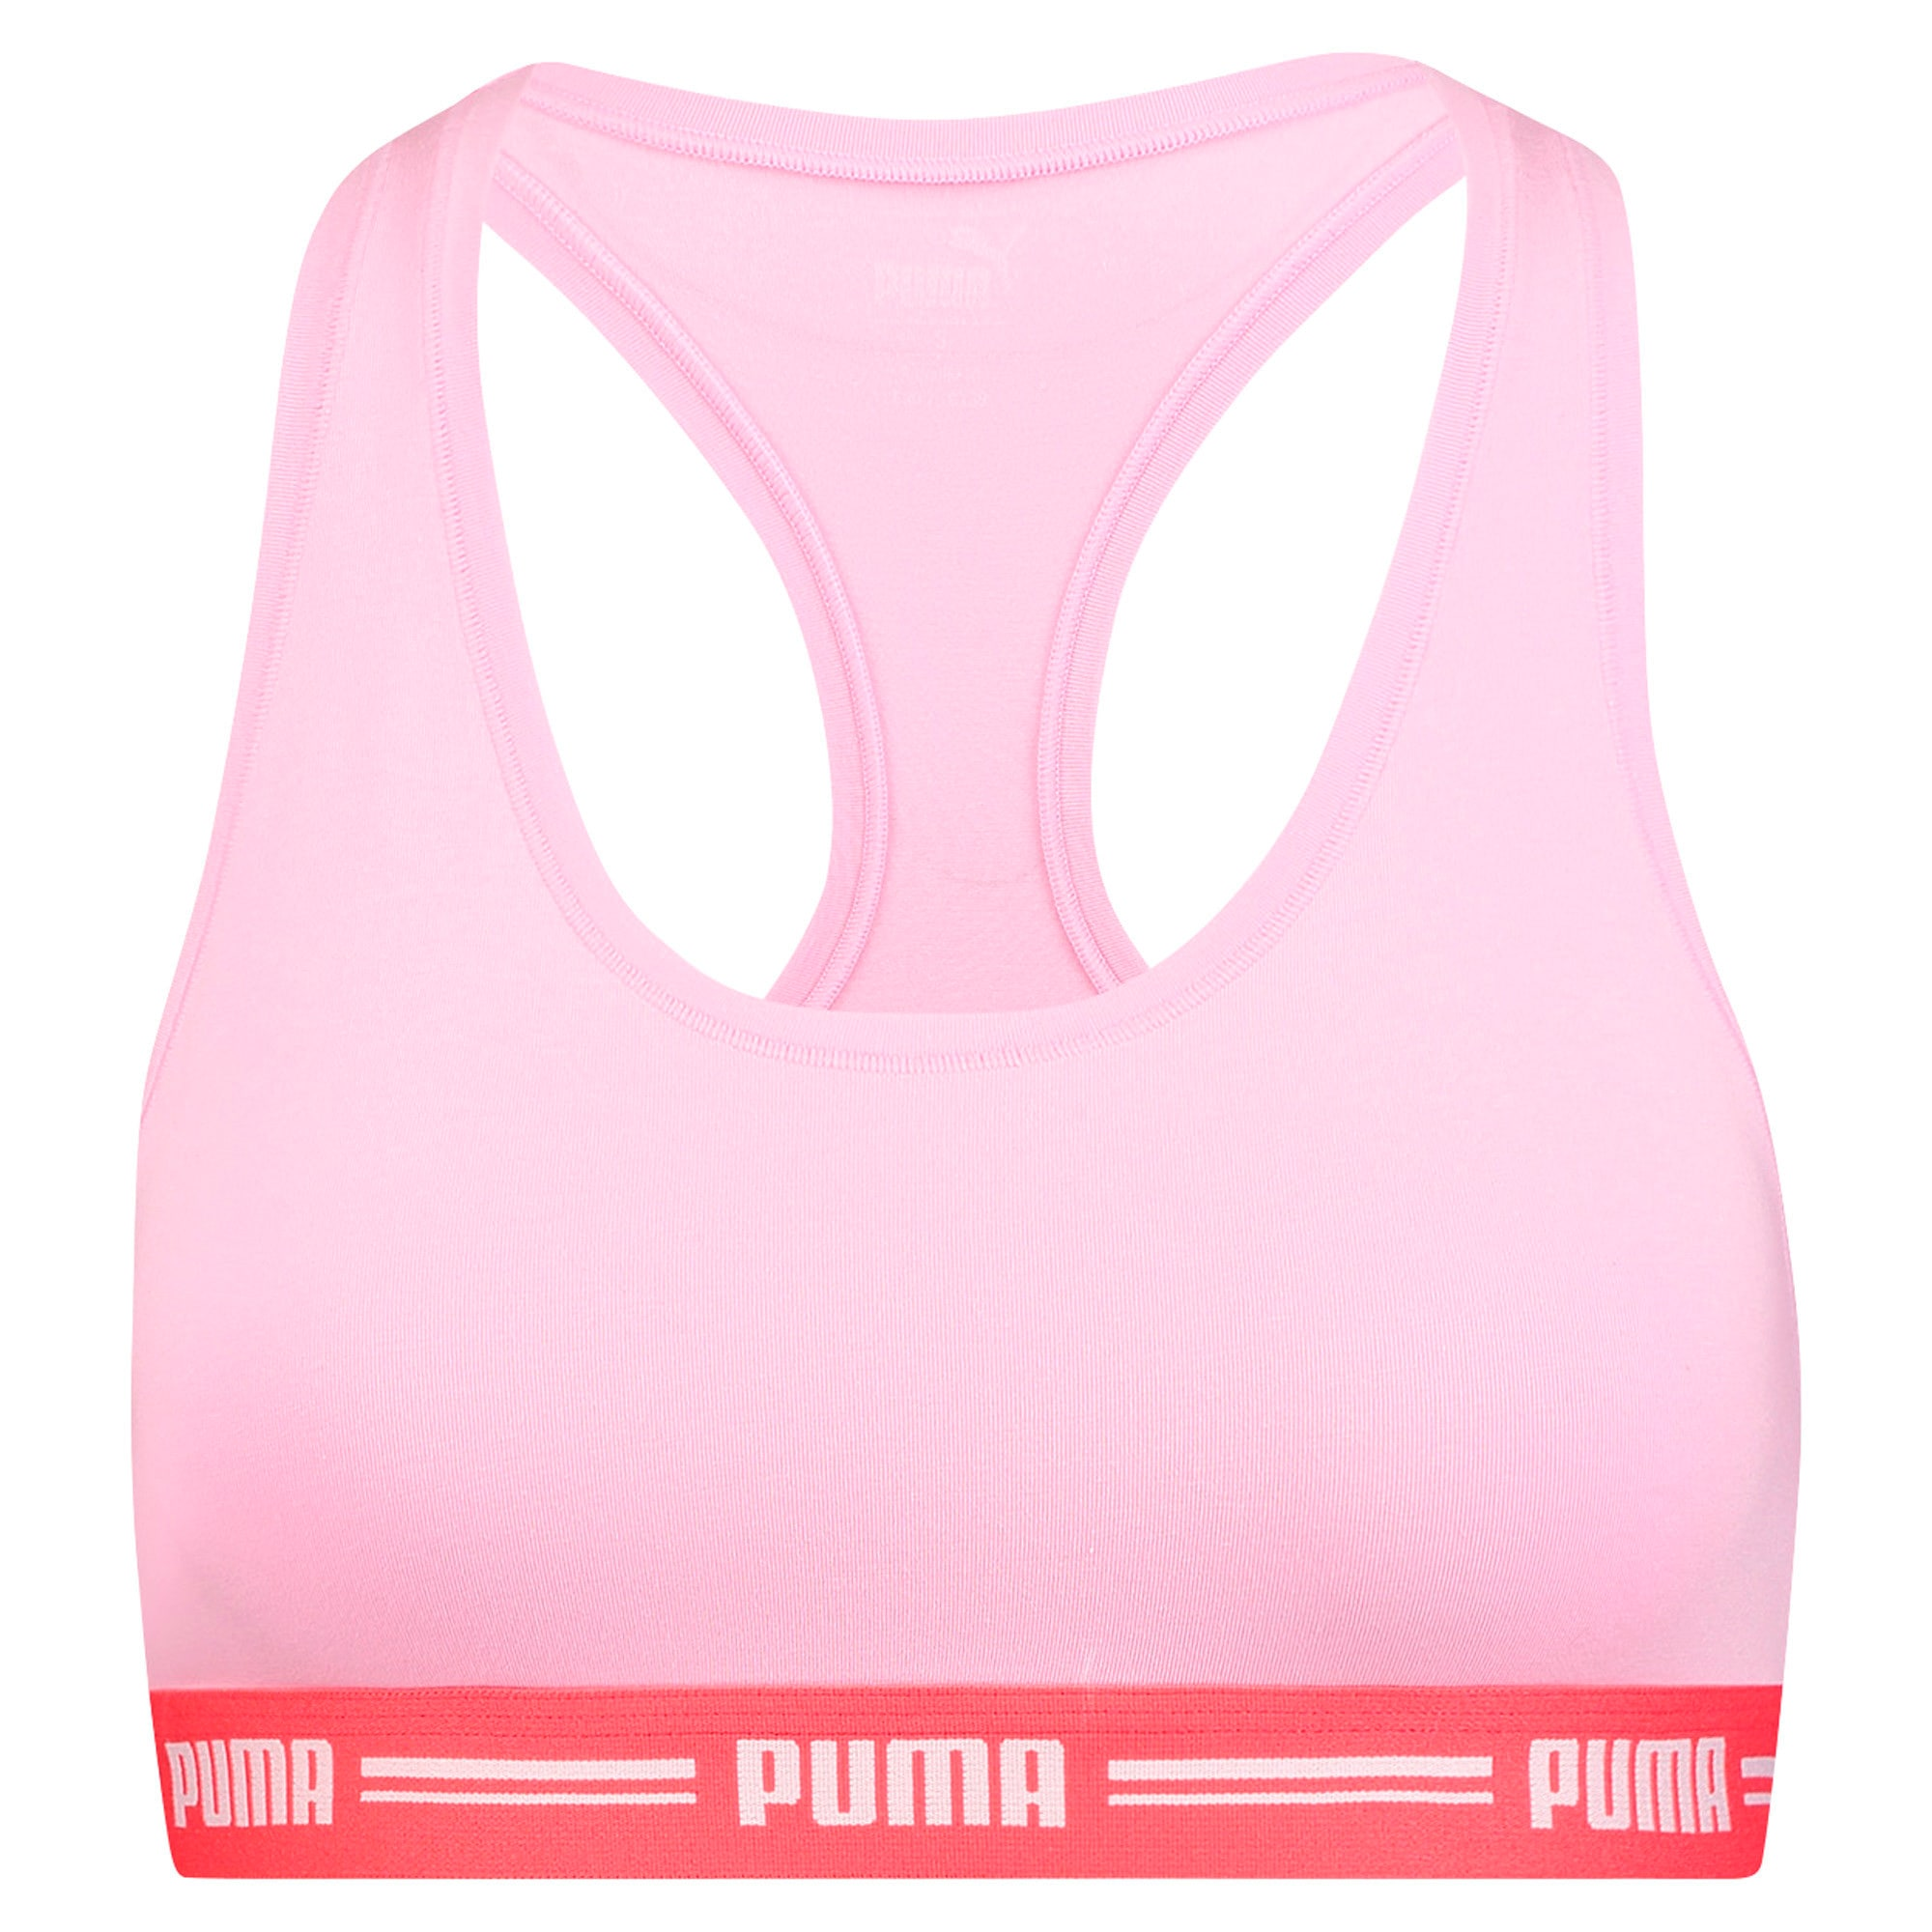 Thumbnail 3 of Iconic Racerback Women's Bra, pink / red, medium